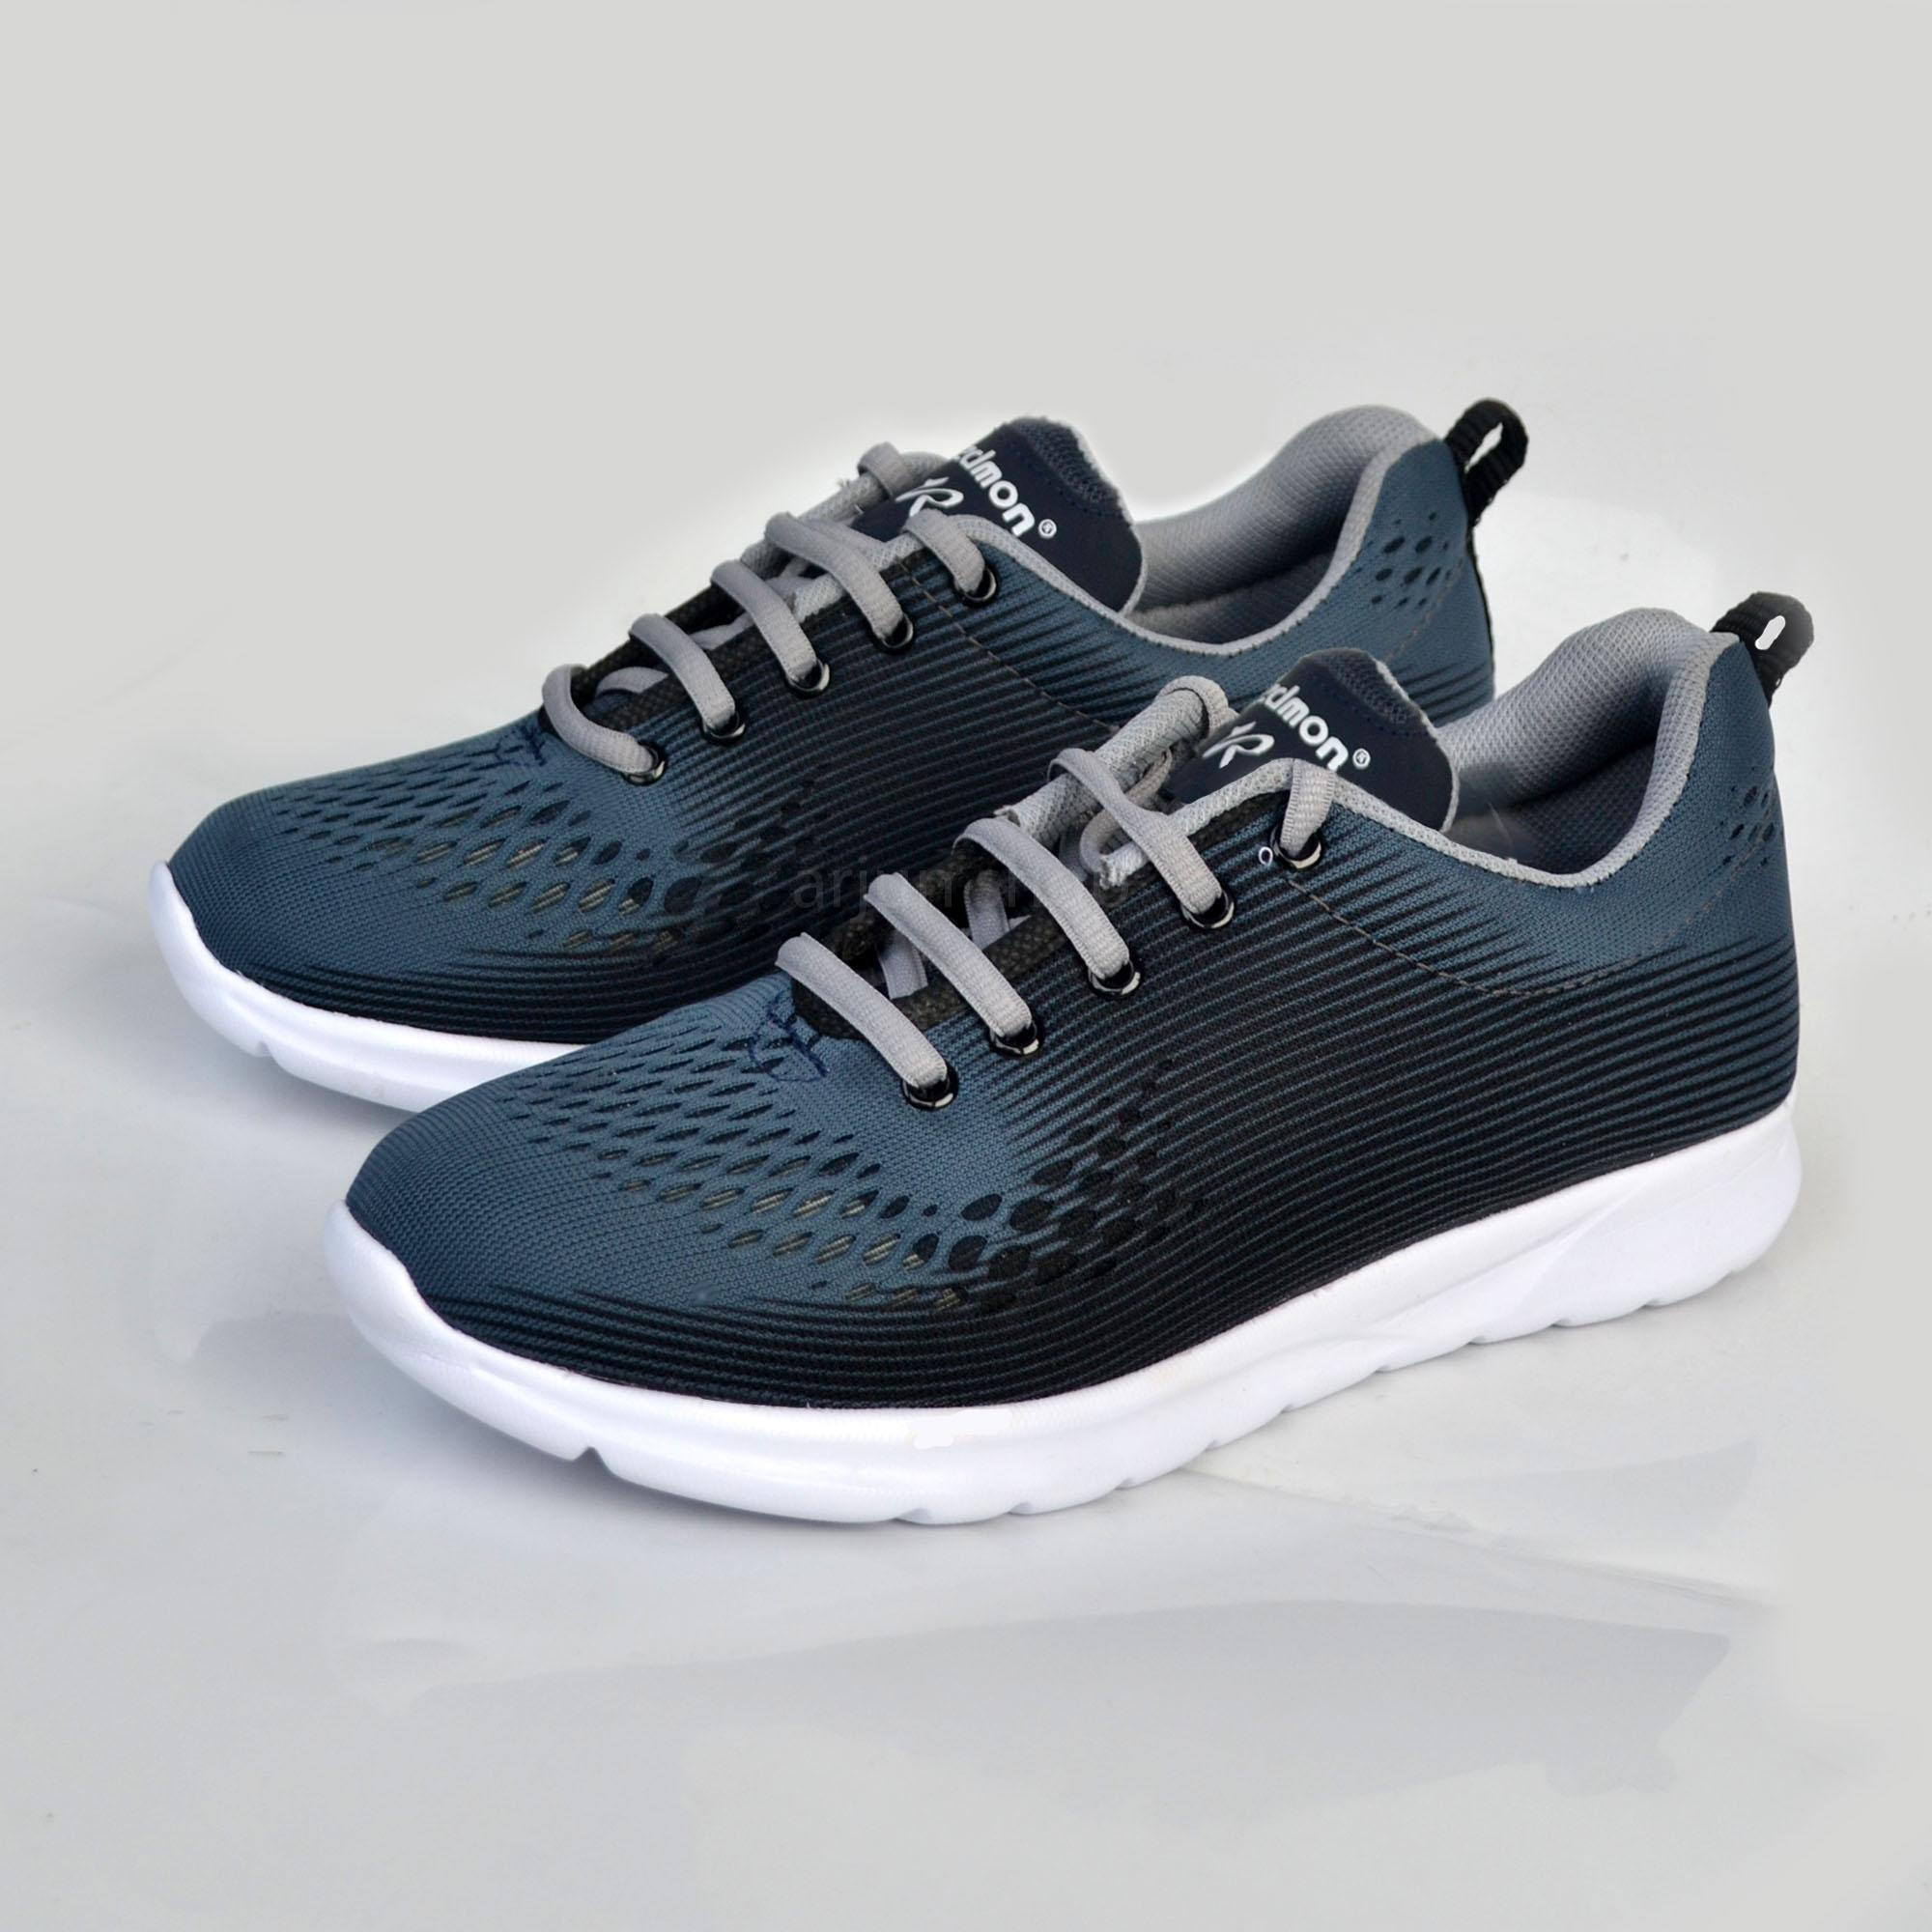 Arjun Shop Sneakers-Sepatu Sneaker Running Carson Runner Unisex Trendy 2019 - Blue